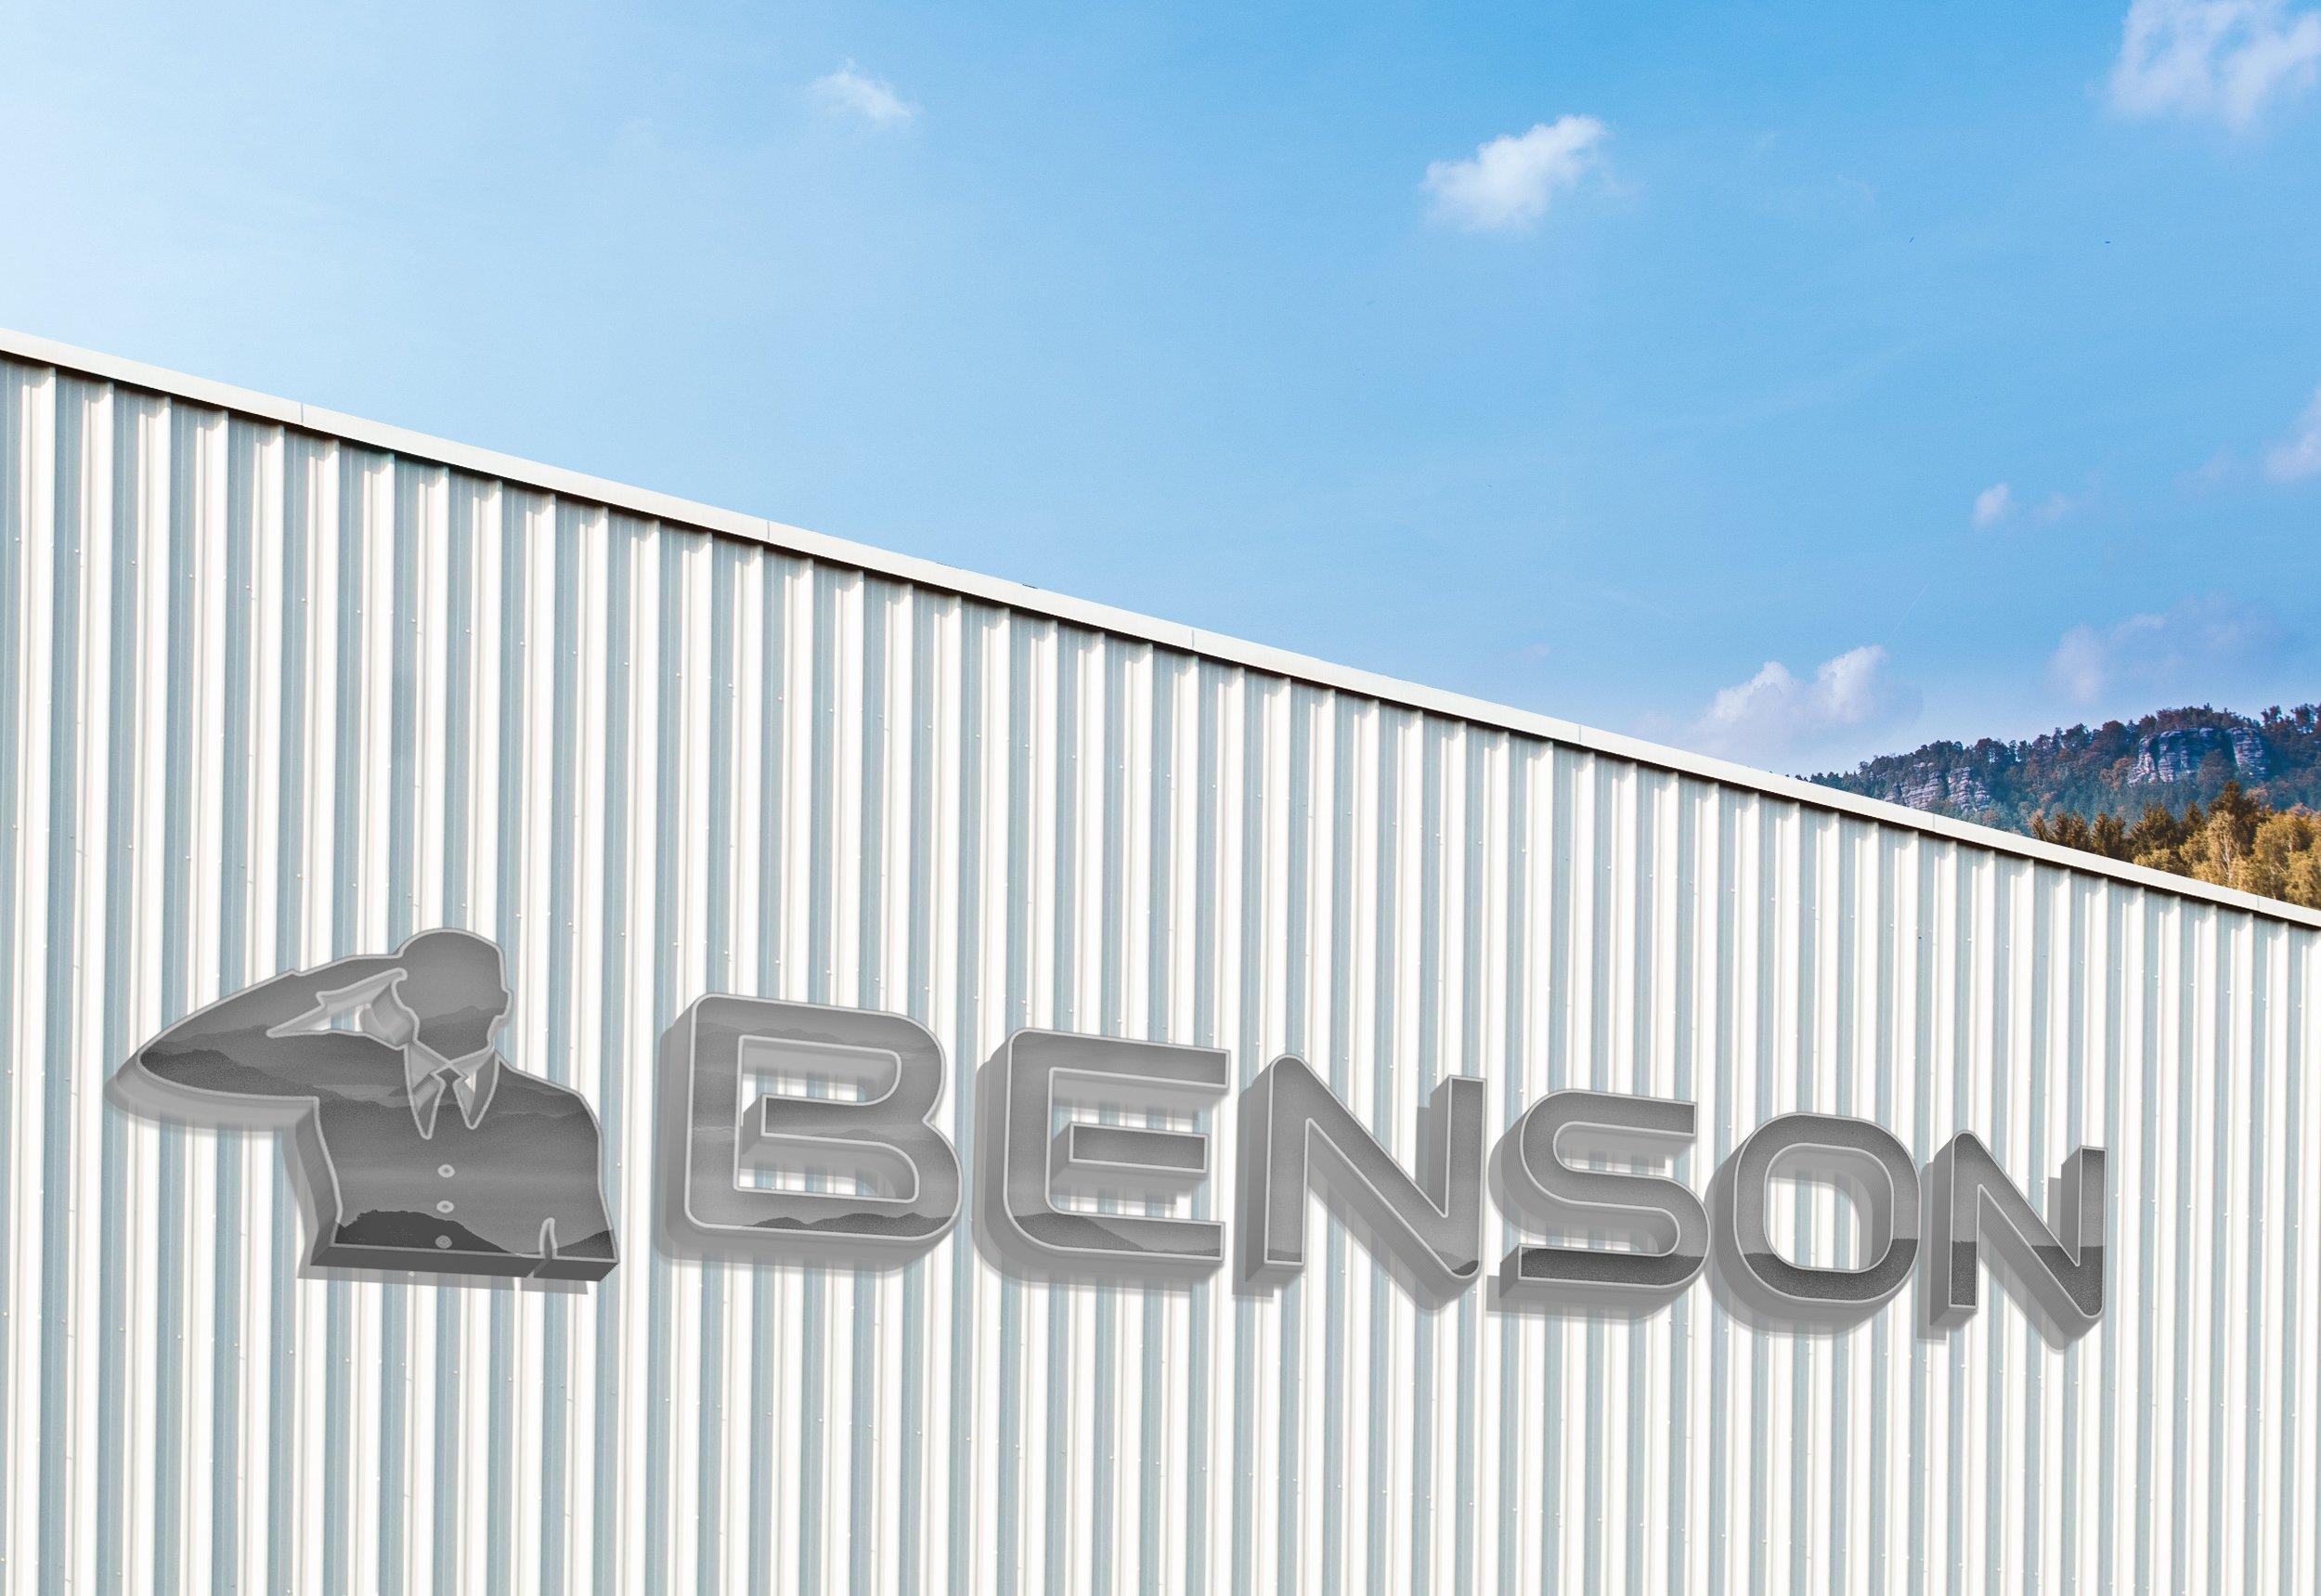 Website-Development-Benson-Logo